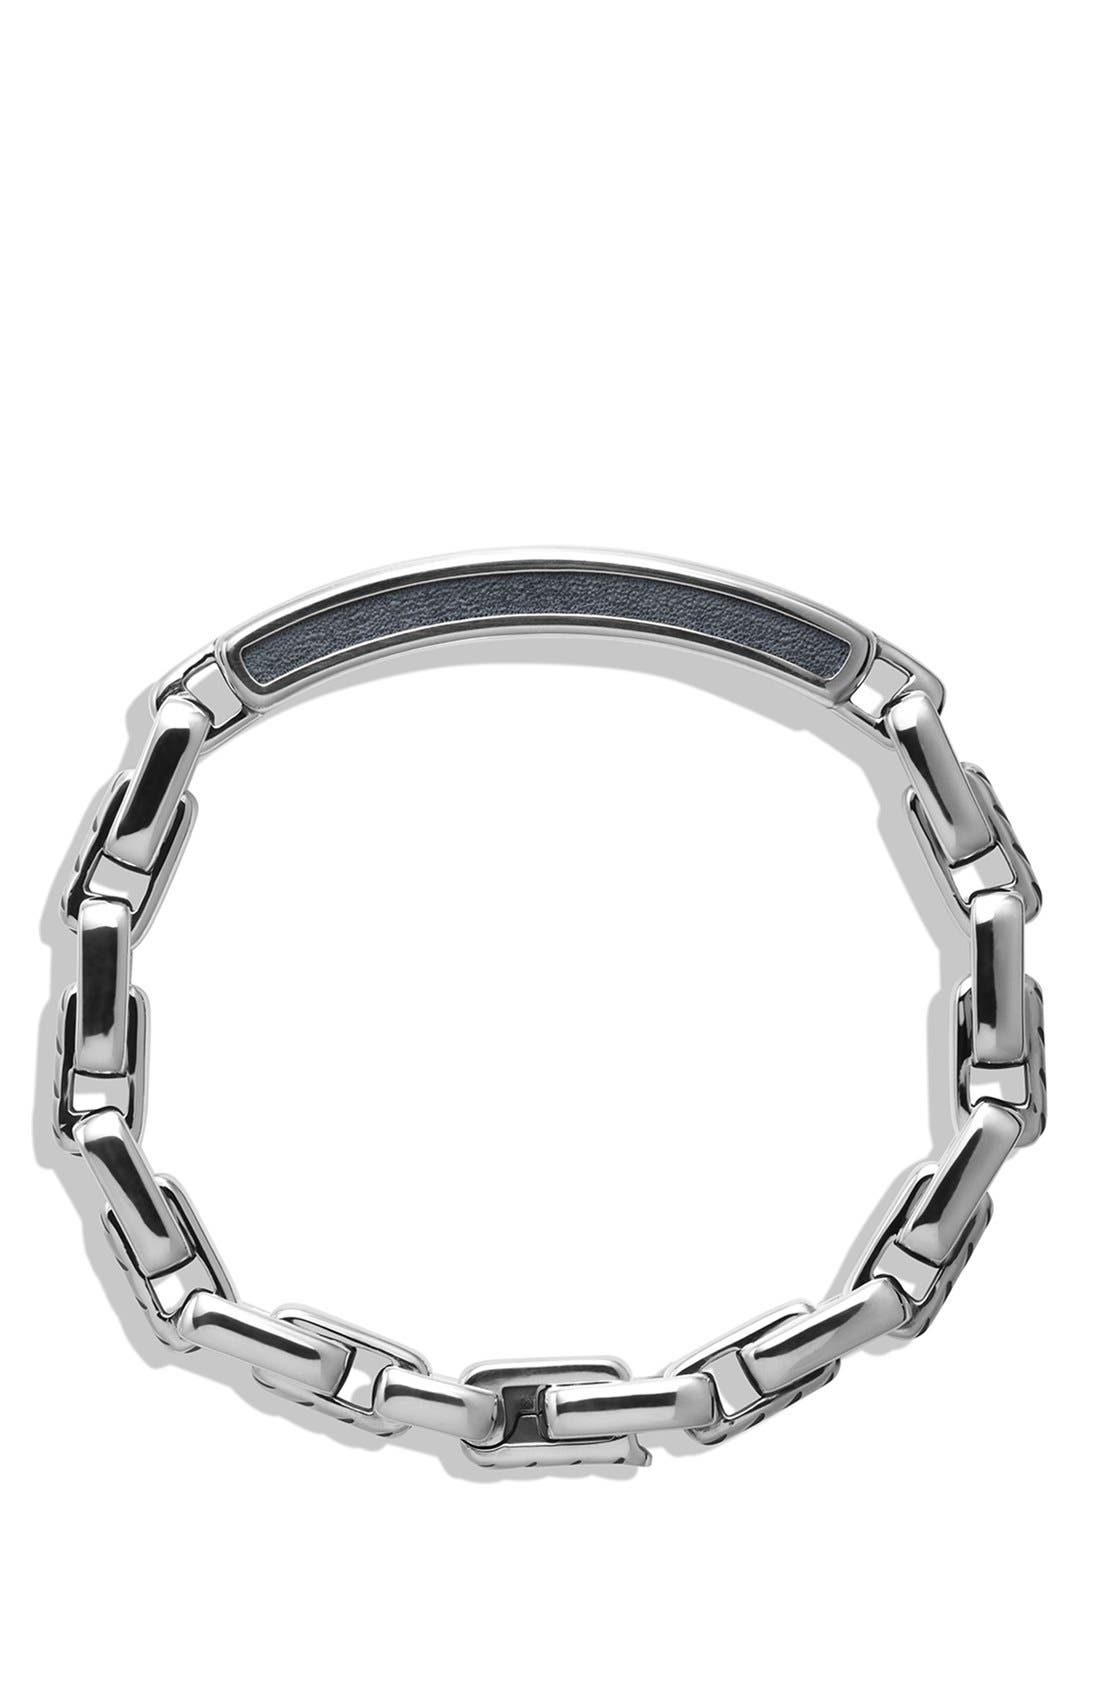 'Modern Cable' ID Bracelet,                             Alternate thumbnail 2, color,                             SILVER